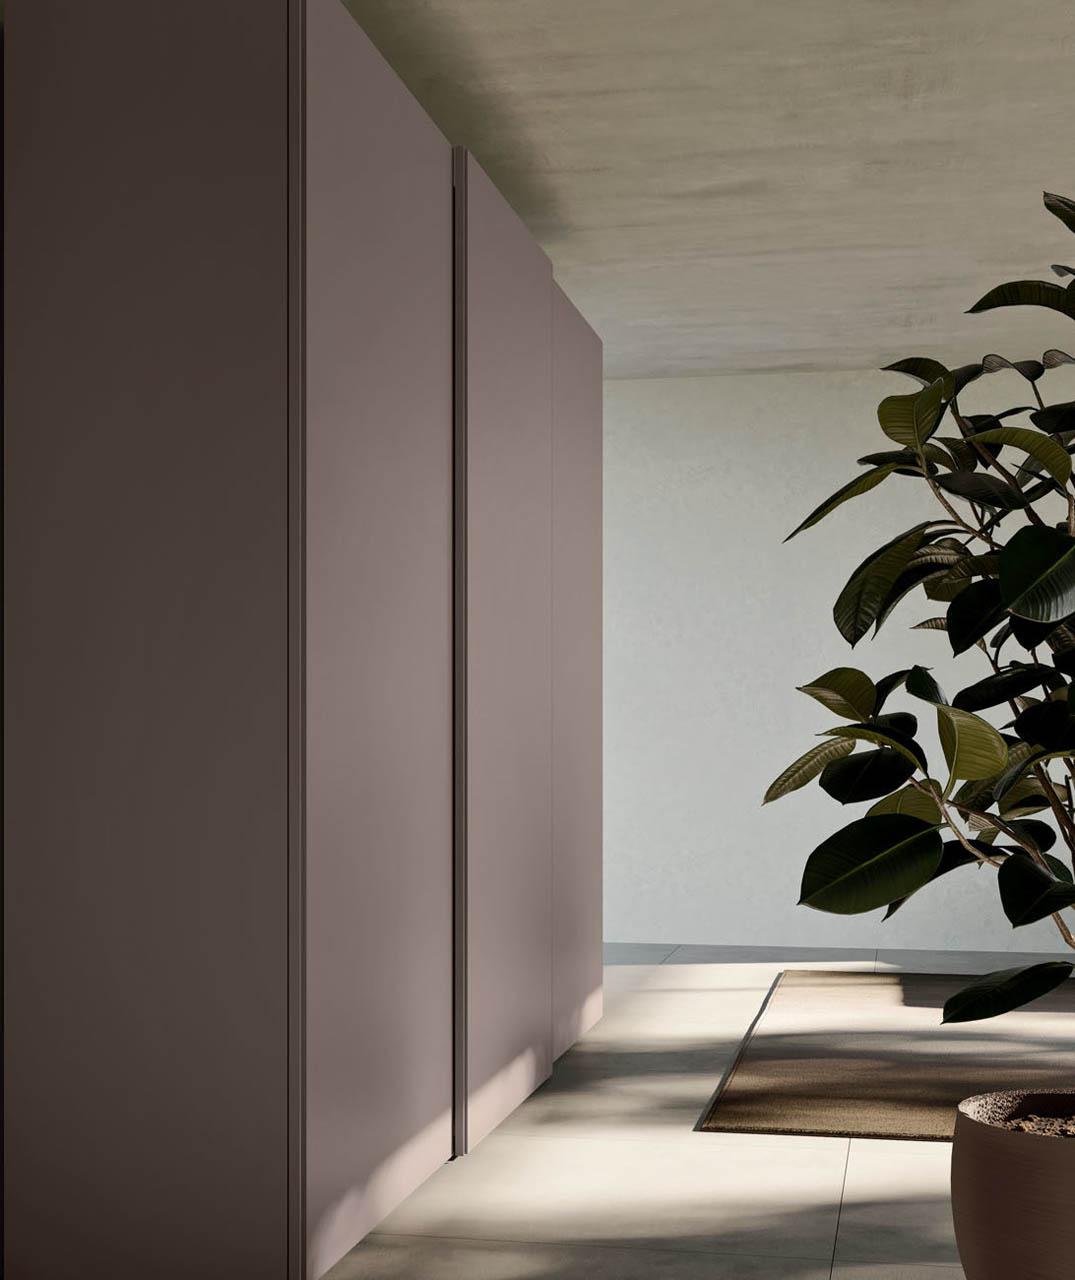 armadio-scorrevole-anta-gola-4-orme-1092x1300